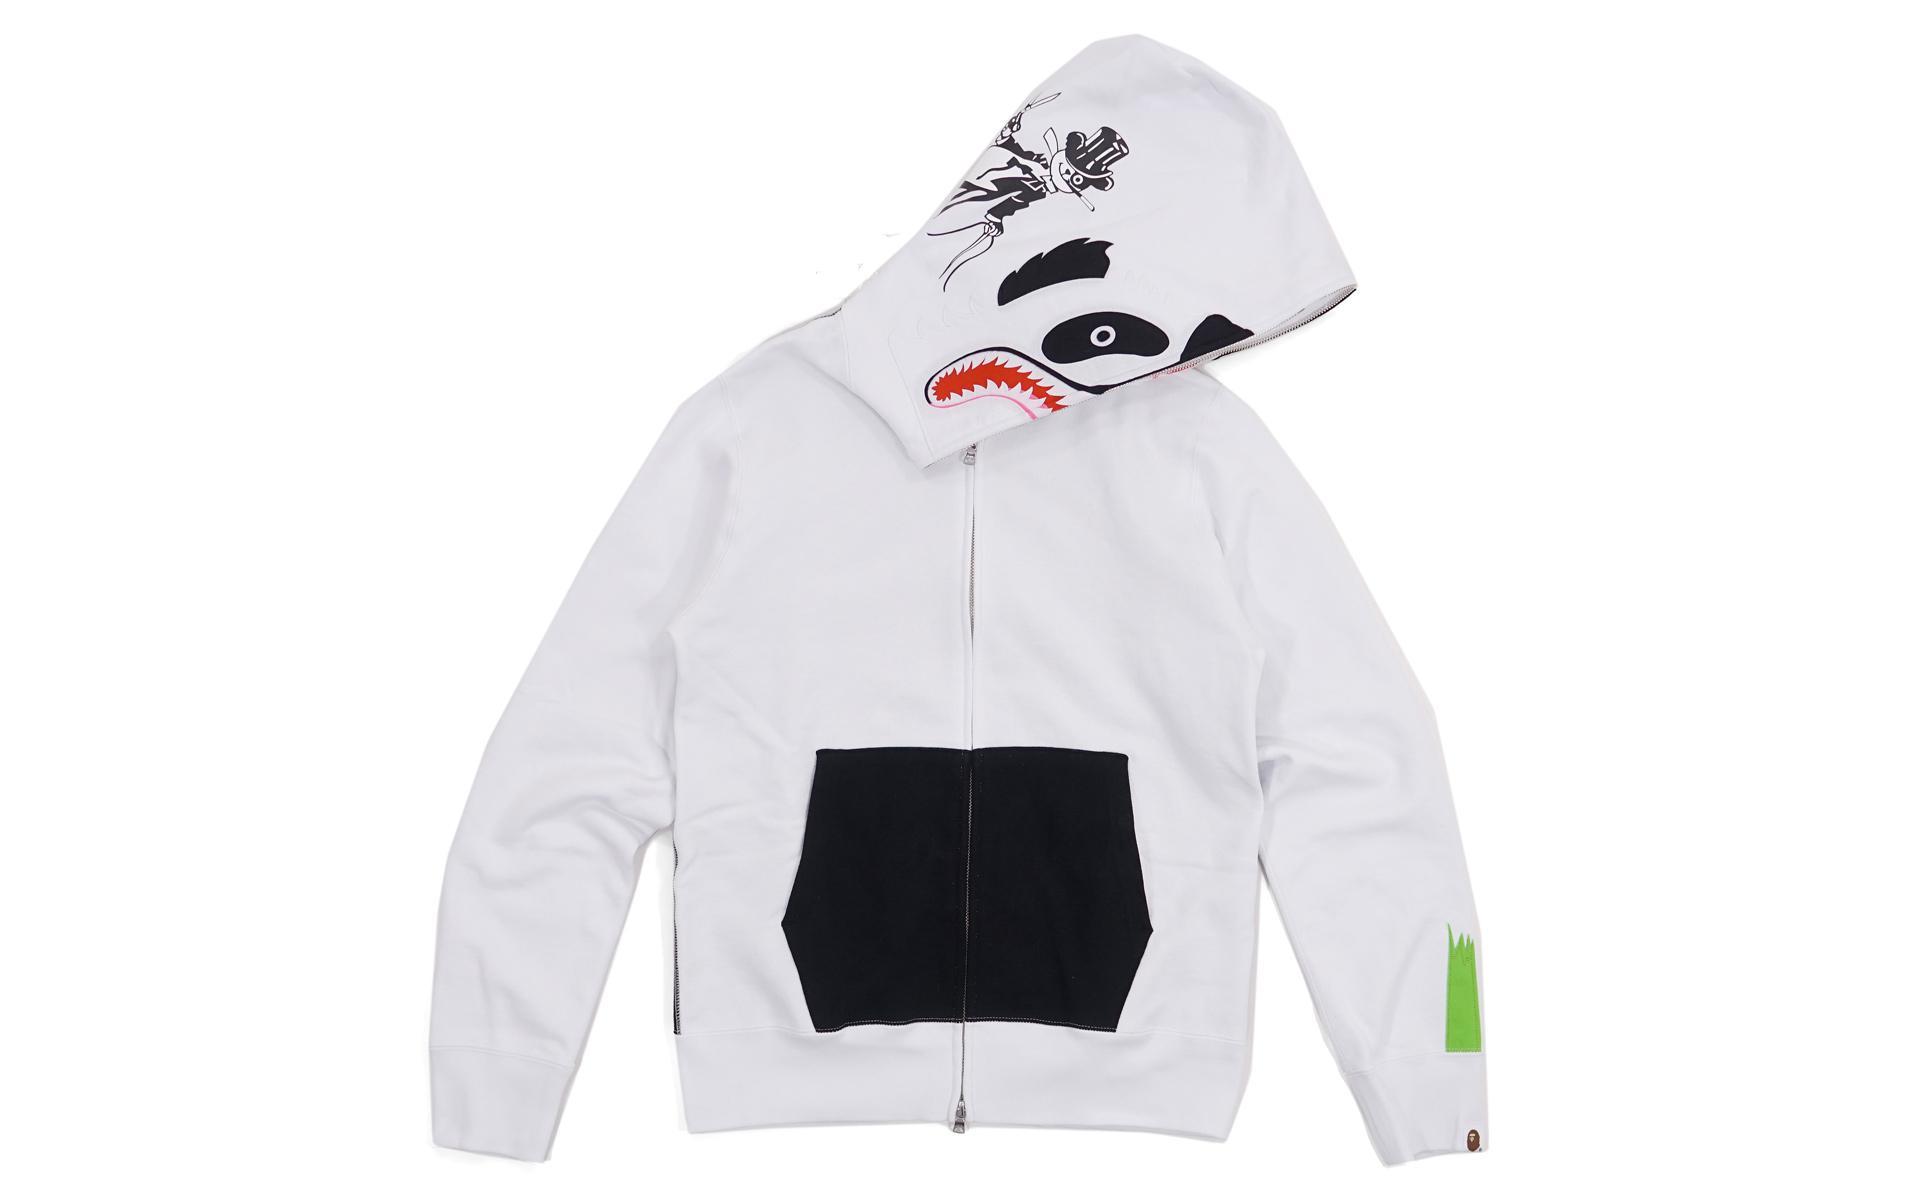 0f2ff13a599c Lyst - A Bathing Ape Two Tone Panda Hoodie White black in White for Men